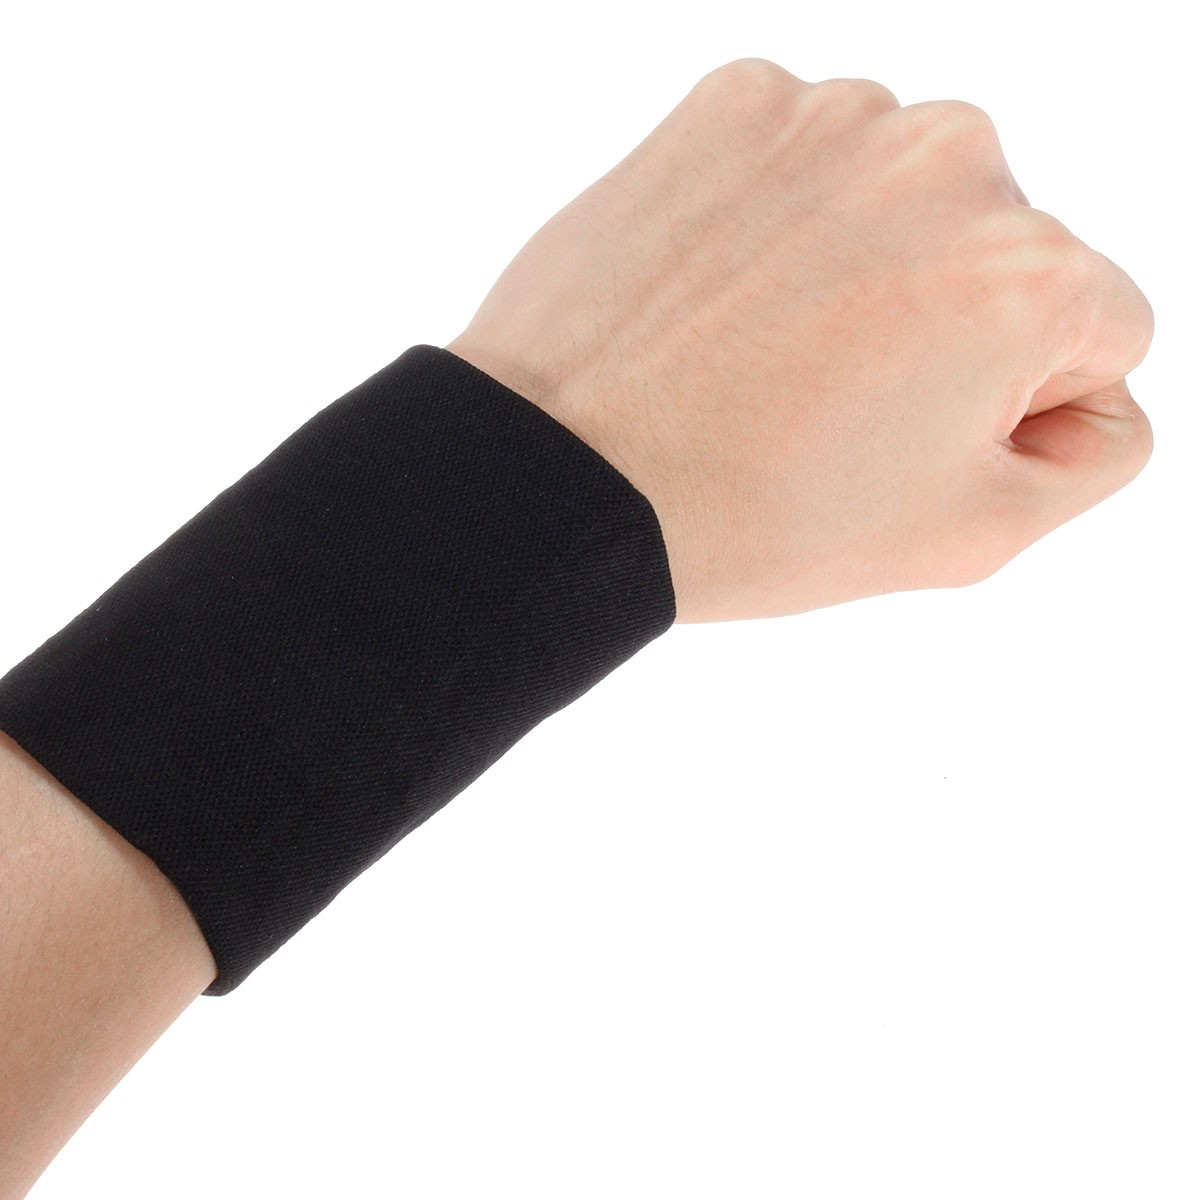 1 Pair Elastic Wrist Support Brace Brand Basketball Tennis Wristband Sports Wrist Wraps Fitness Brace Safty Protection